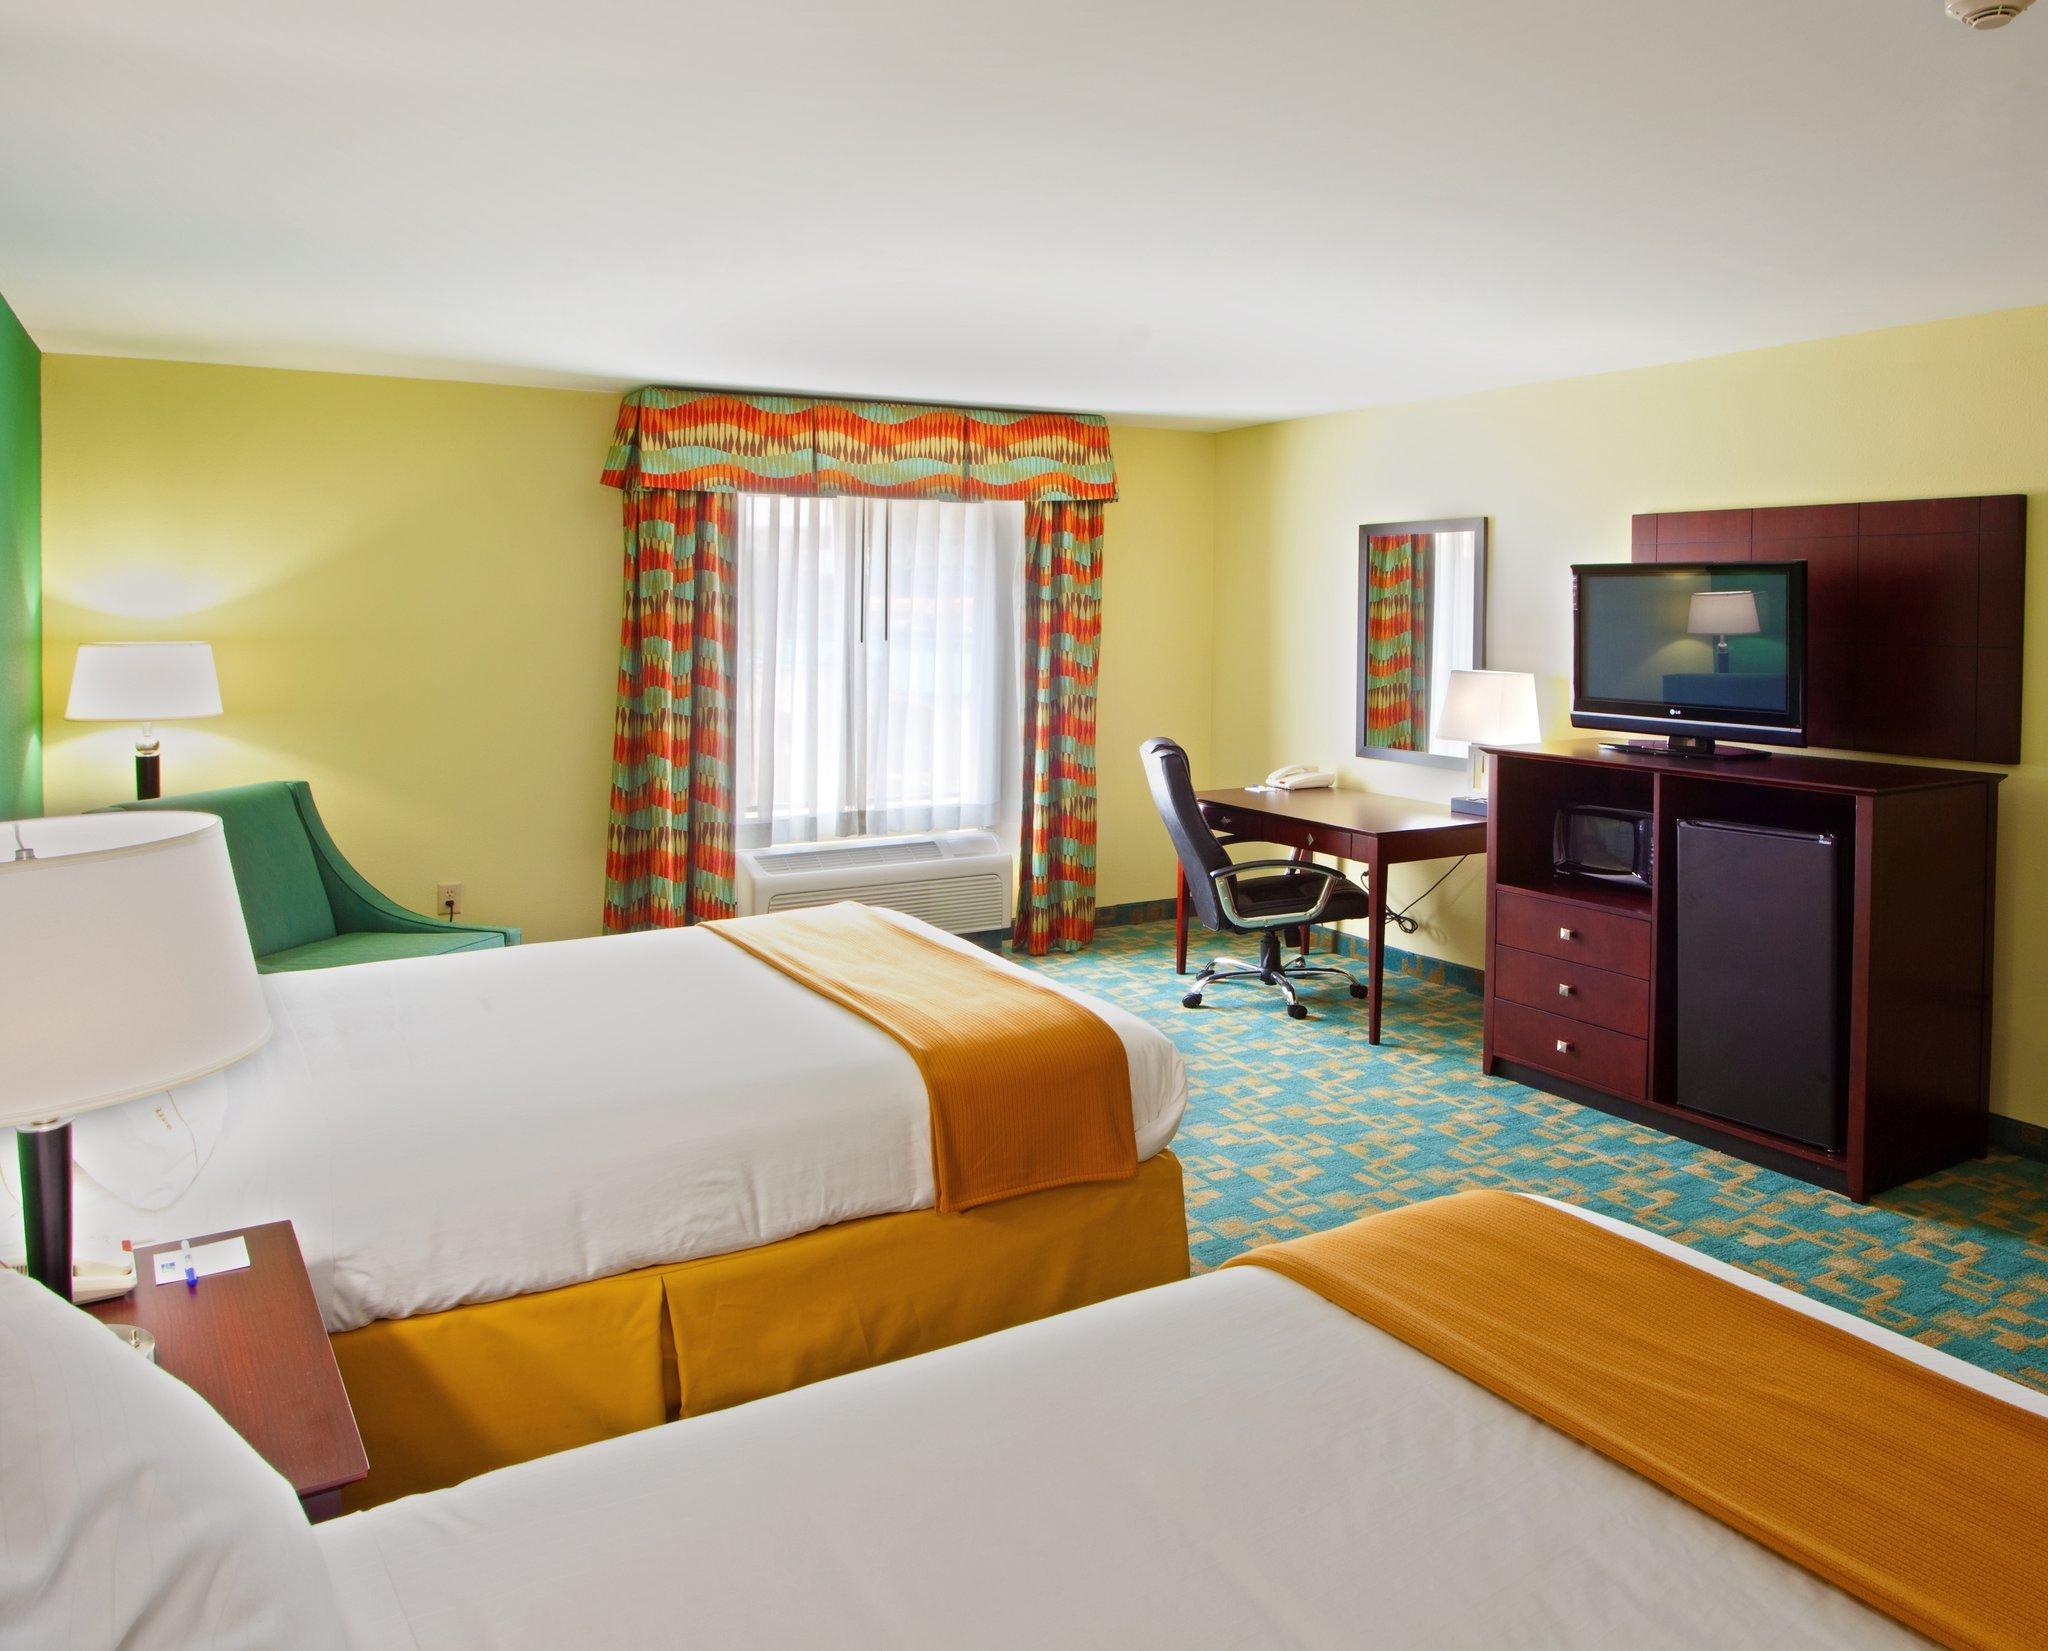 Holiday Inn Express Hotel & Suites Thornburg-S. Fredericksburg